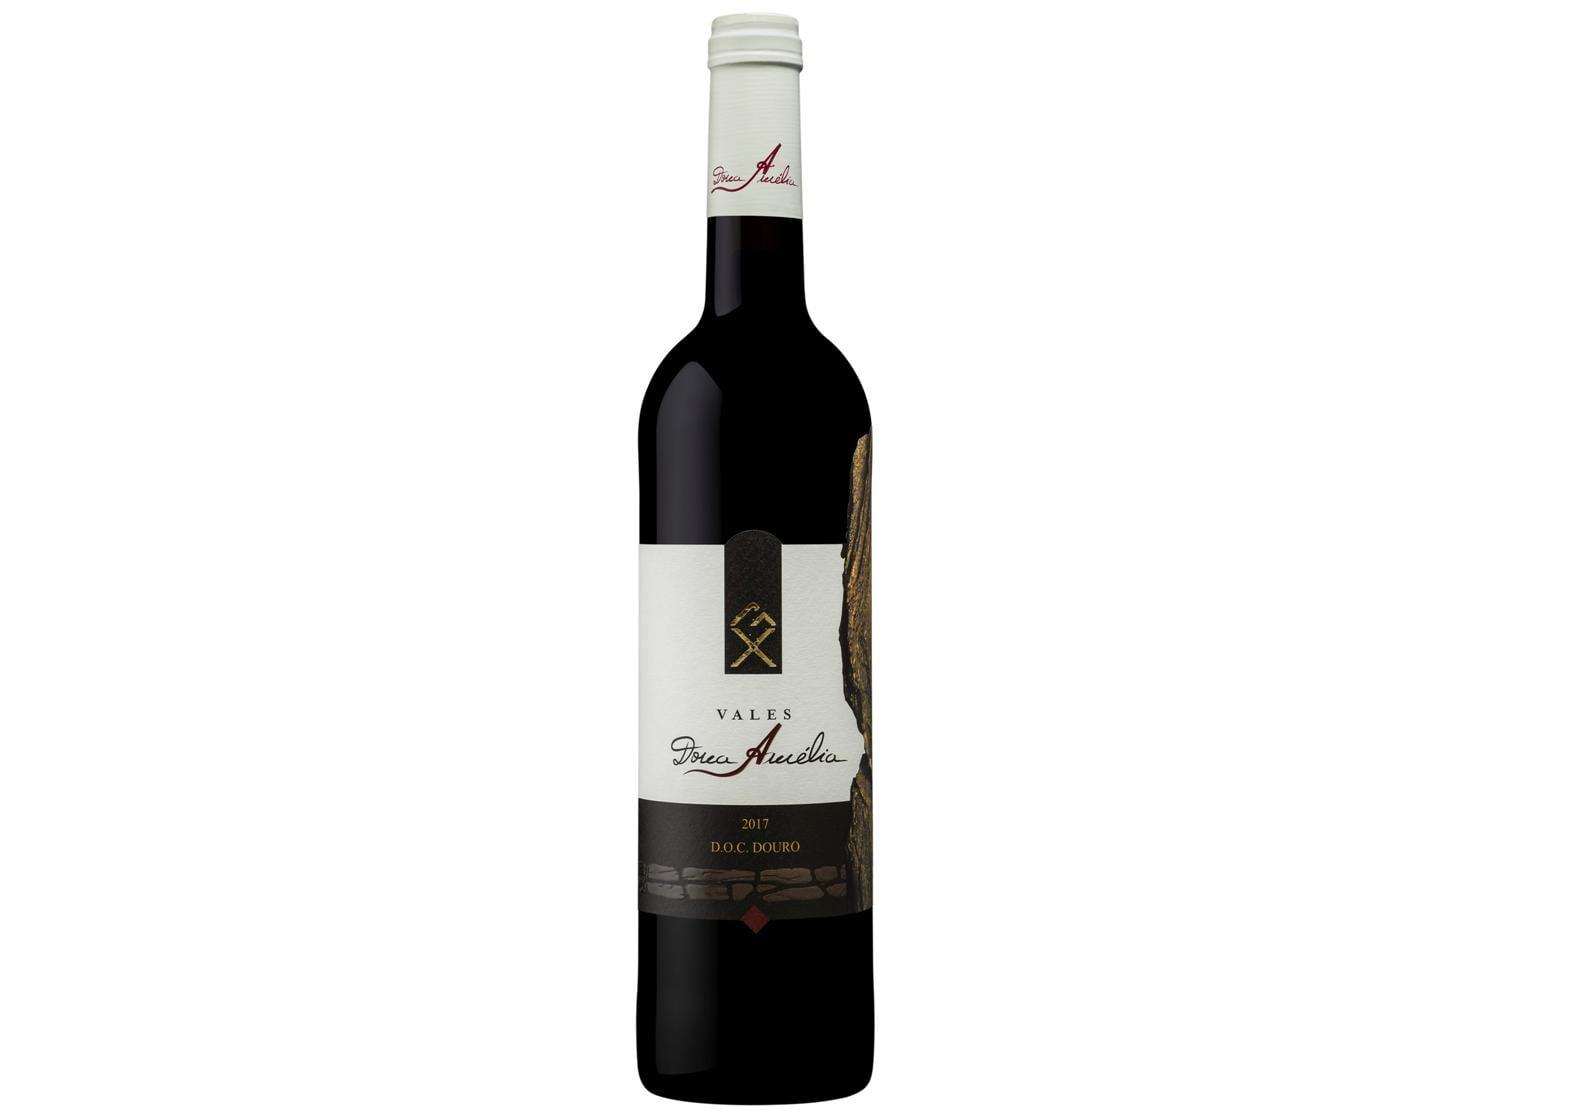 Douro Rouge Dona Amelia - Geraçoes Xisto - Vin du Douro Portugal